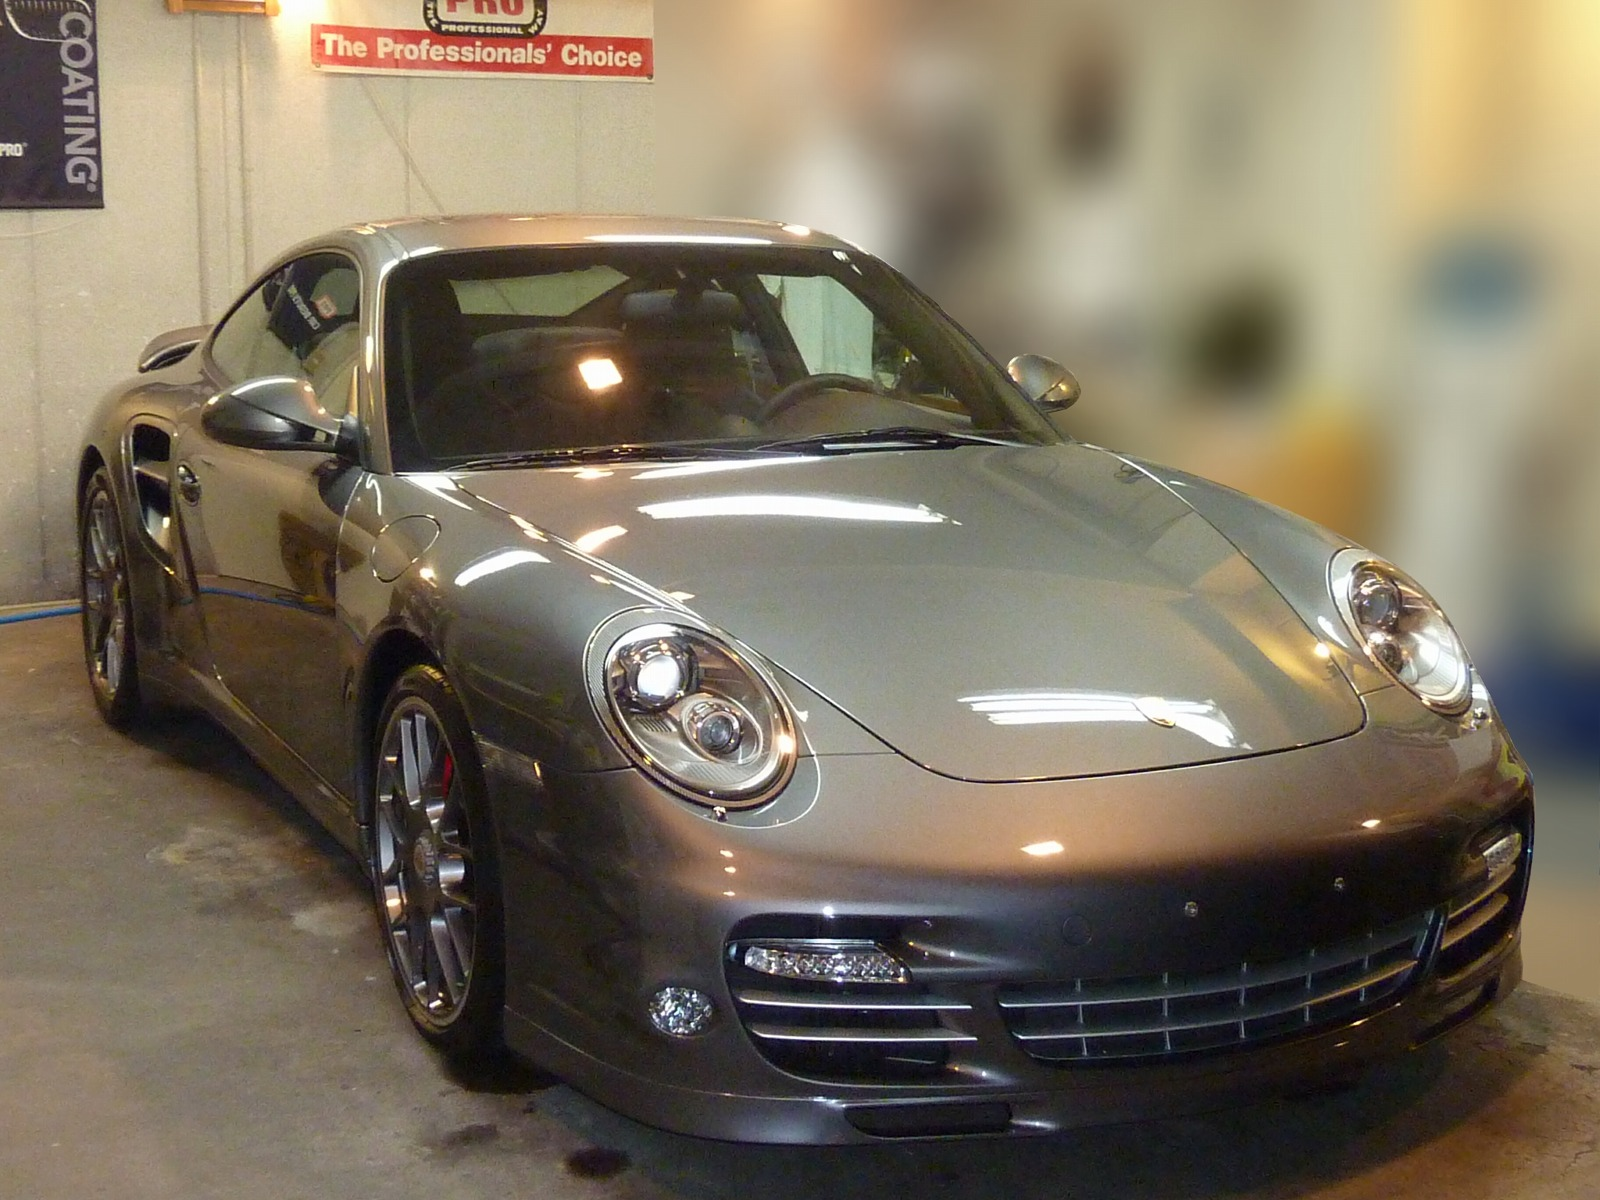 20140212-porsche-911-turbo-01